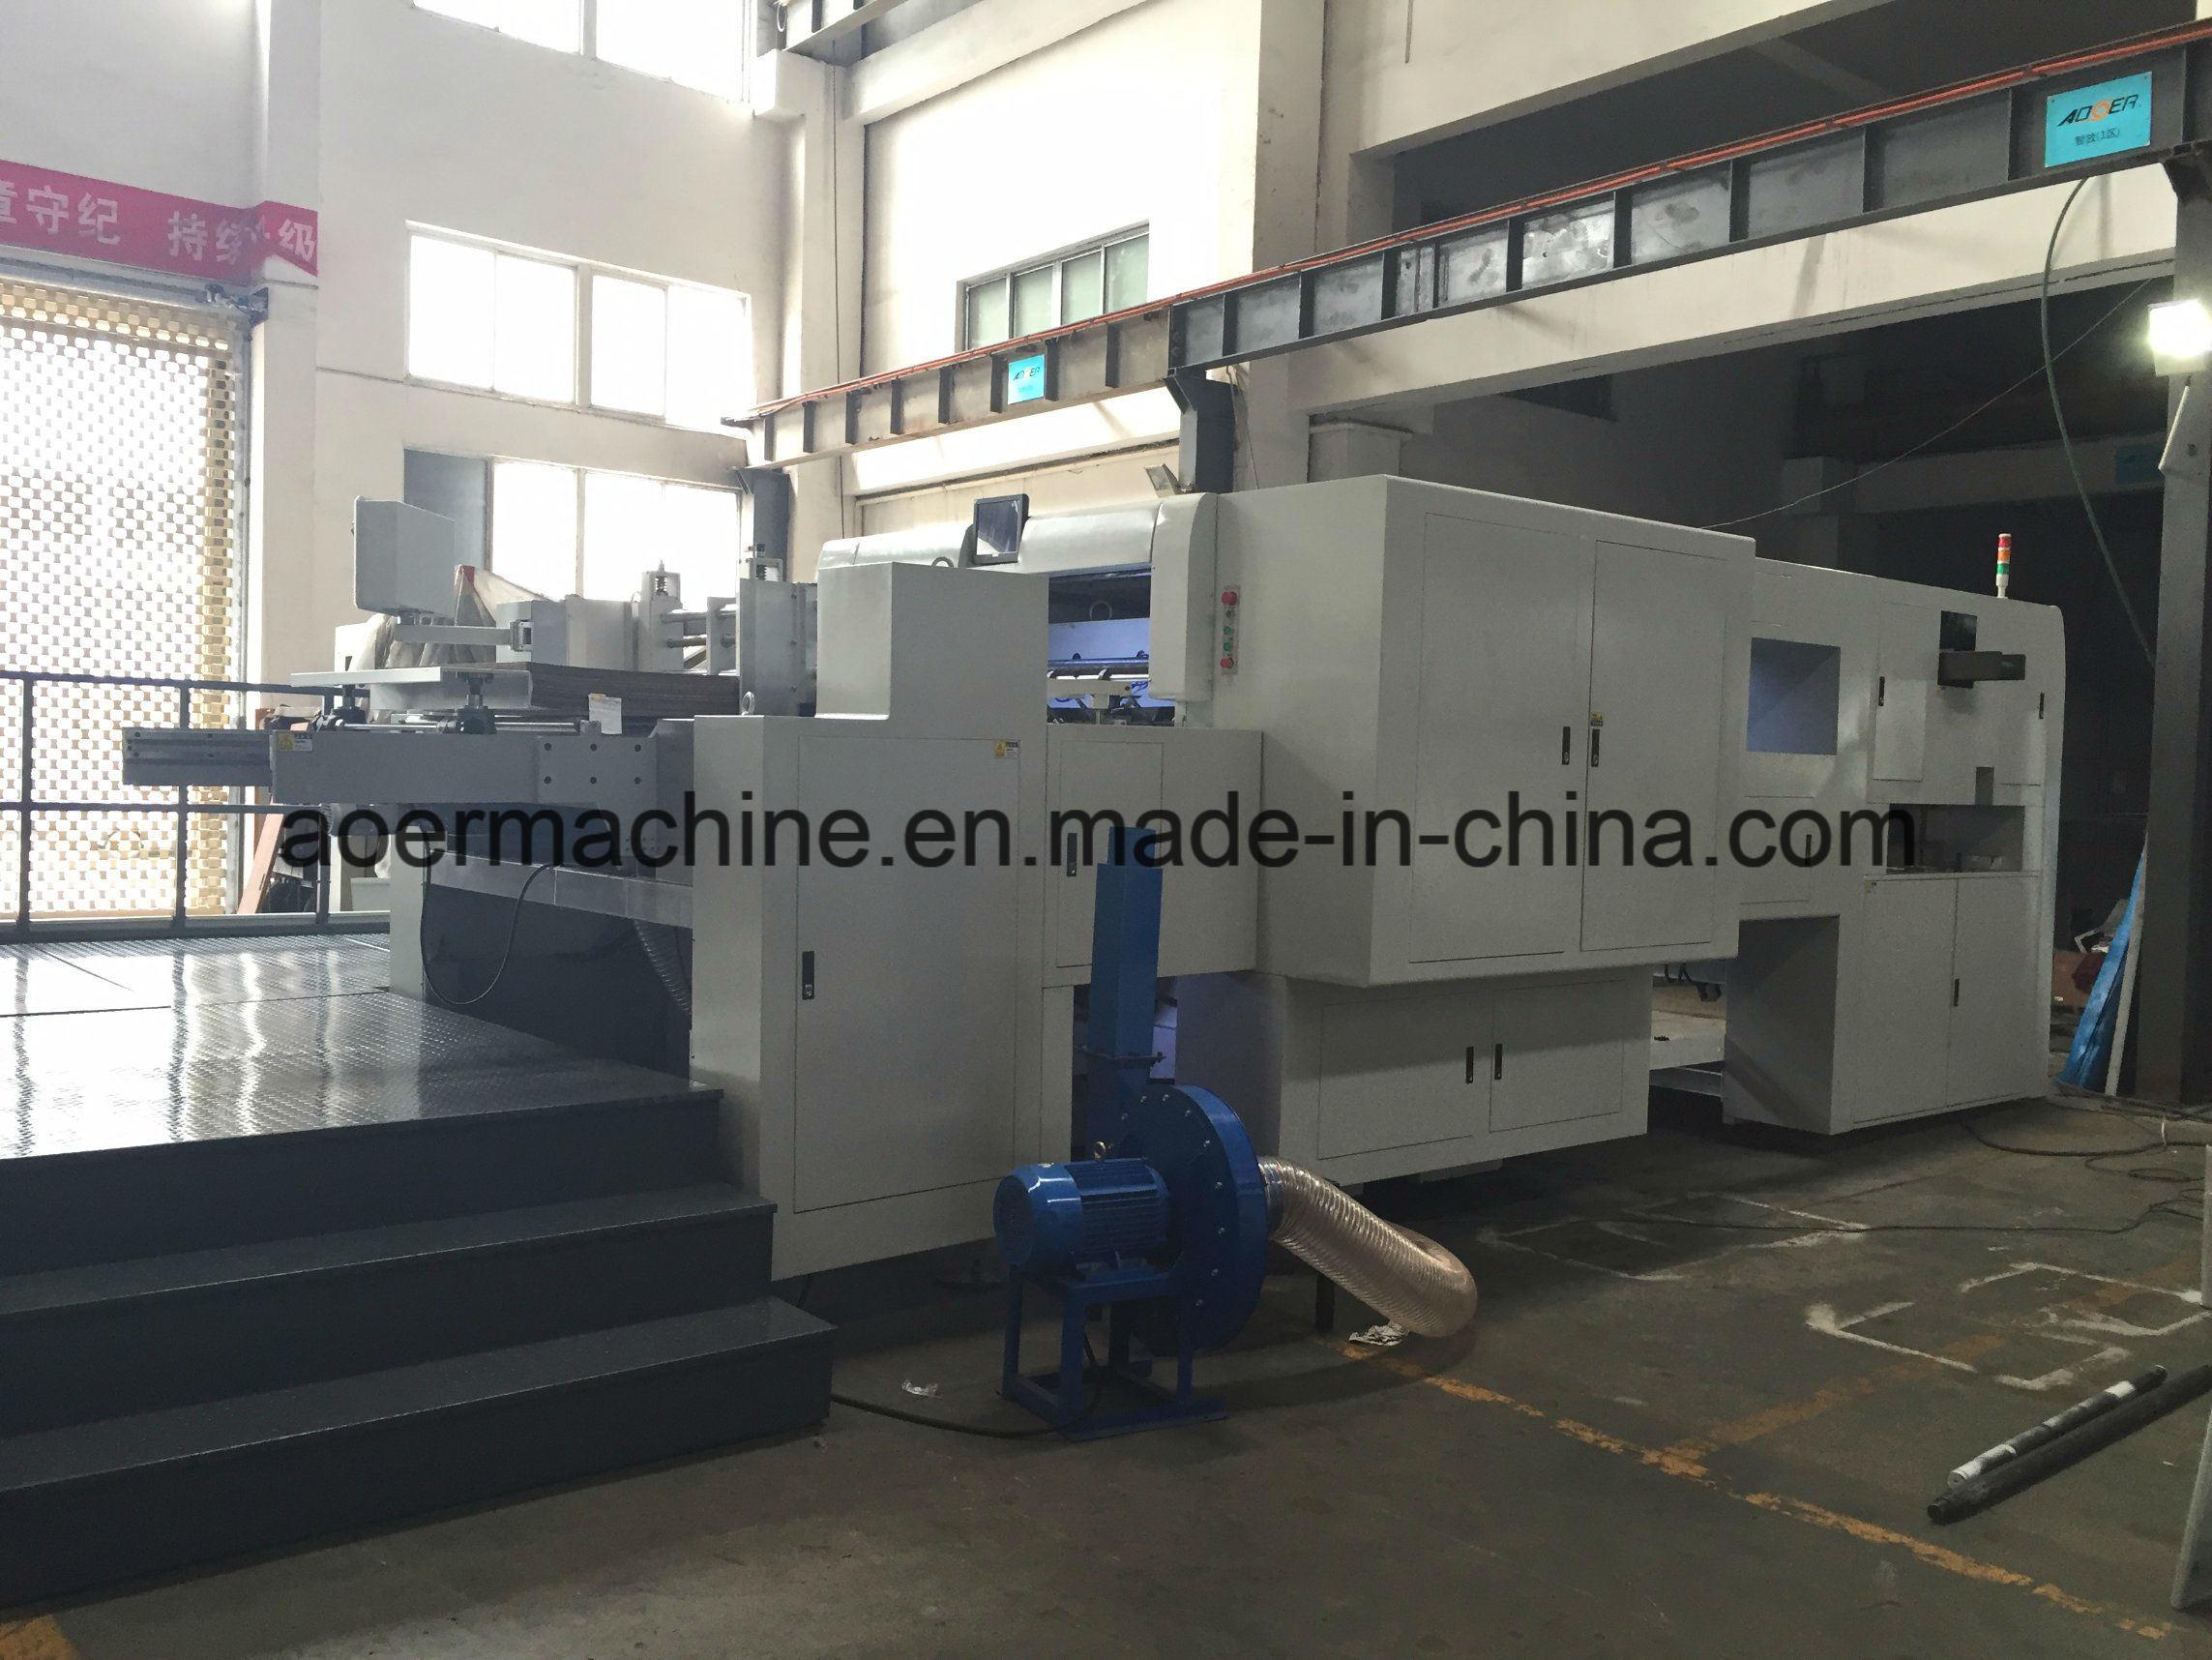 AEM-1650VQ Lead Edge Automatic Stripping Die Cutting Machine